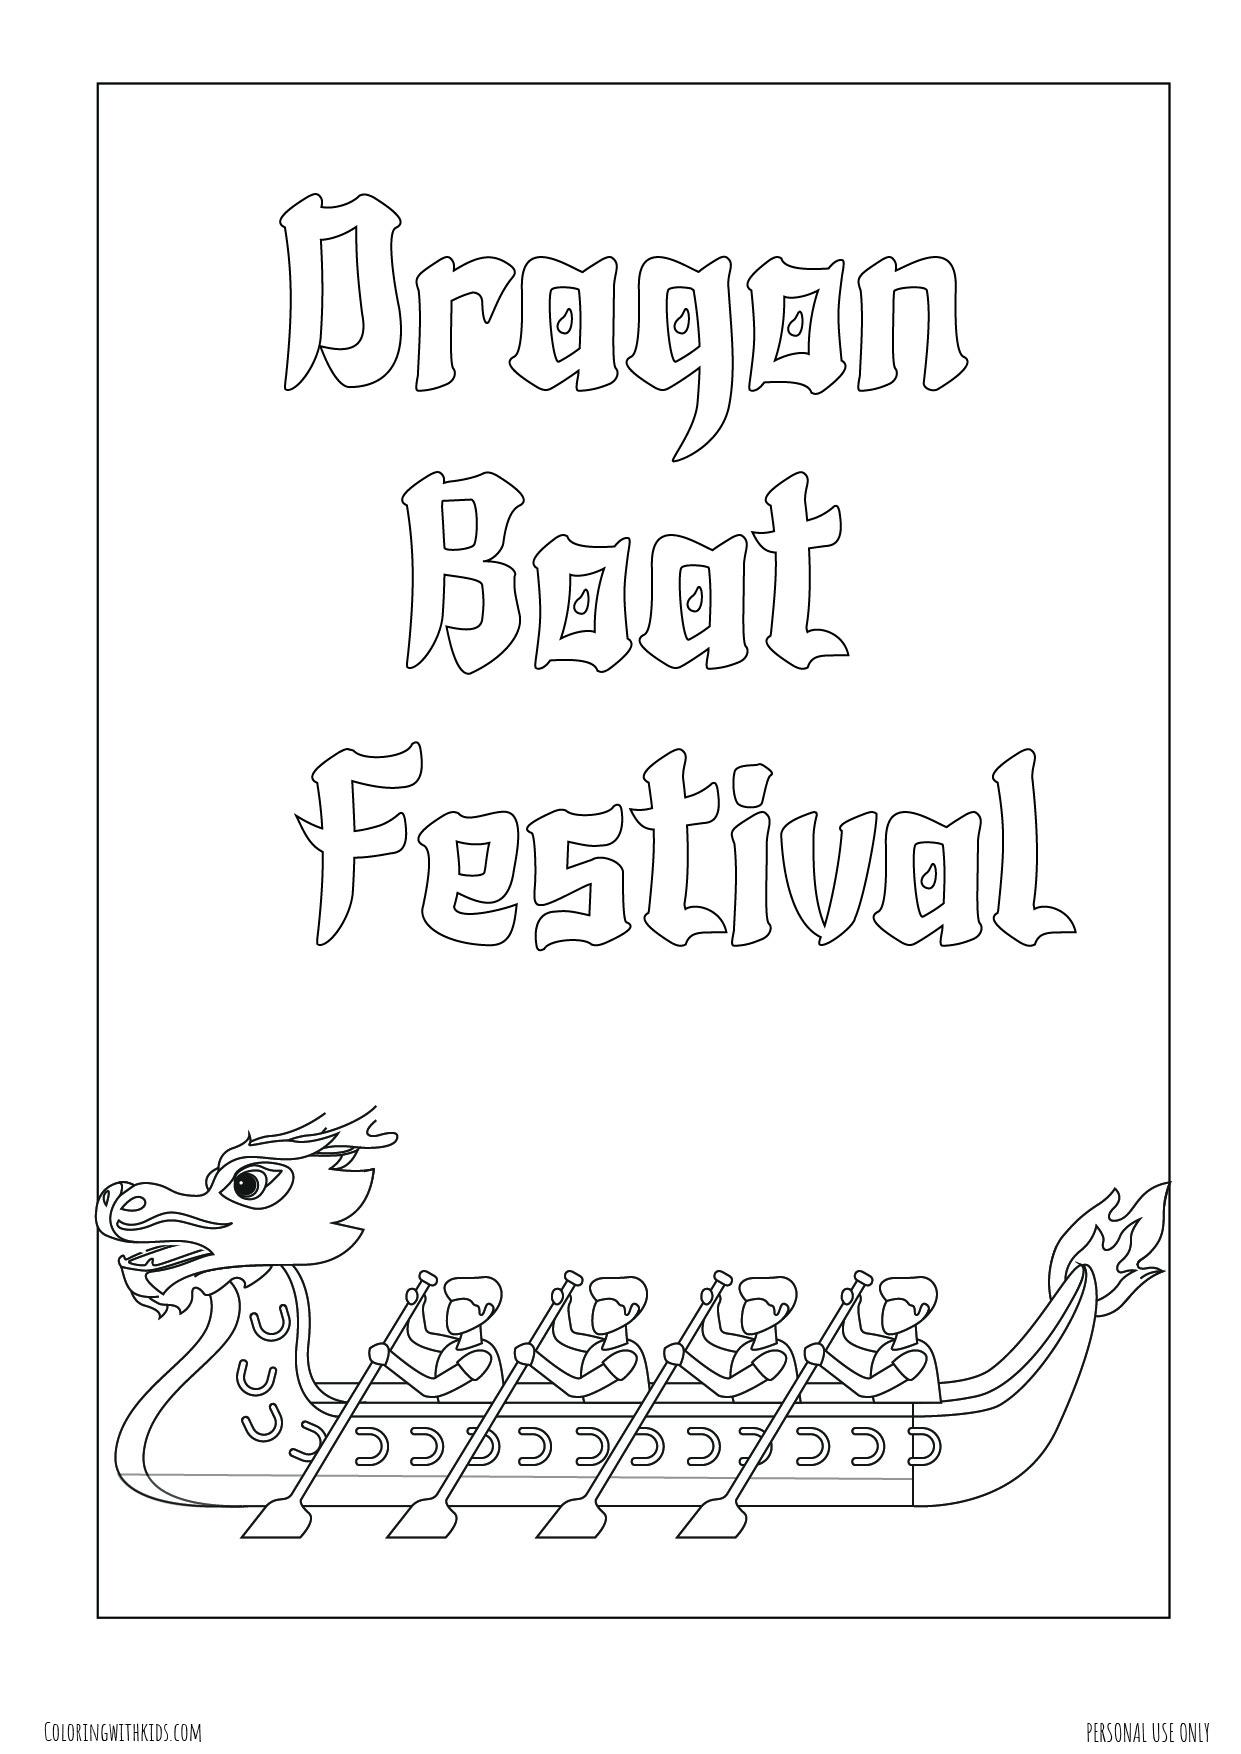 Dragon Boat Festival Coloring page